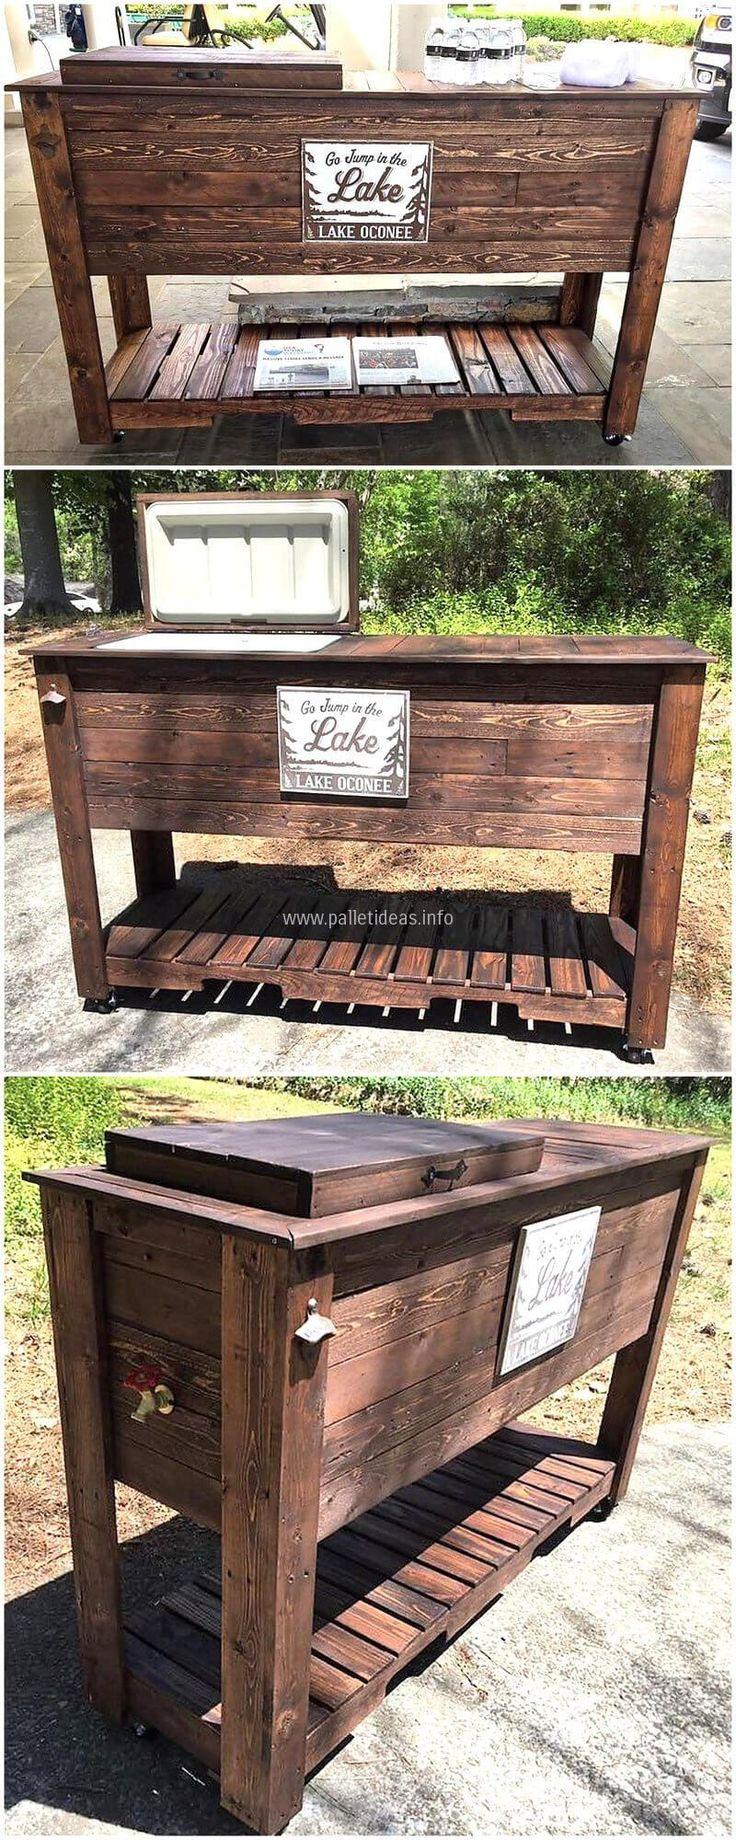 best 25 grillage brico depot ideas on pinterest cuisine exterieur barbecue encastr and. Black Bedroom Furniture Sets. Home Design Ideas